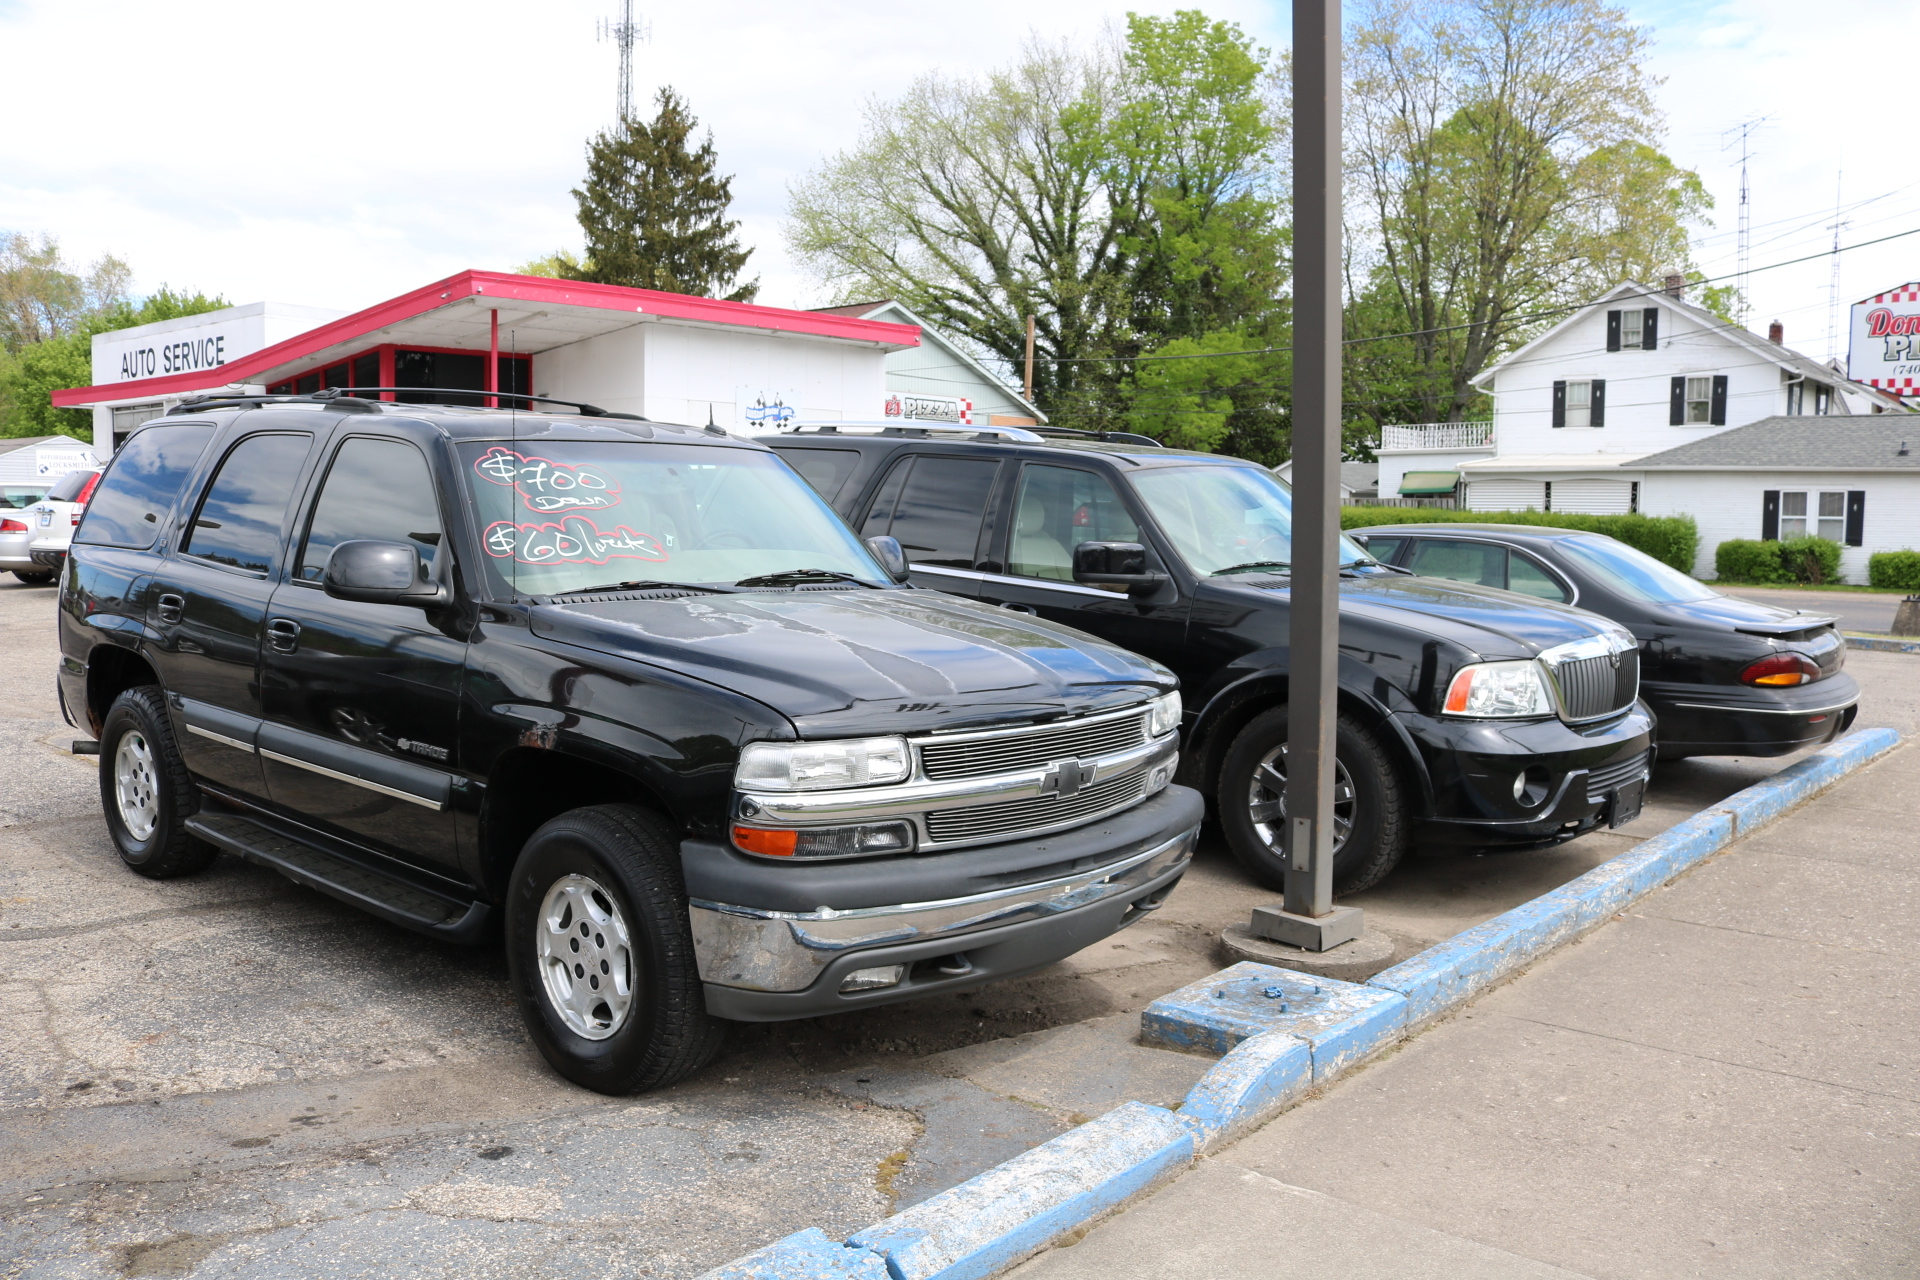 Newark Cadillac Tires >> Allstar Motor Sales in Newark, OH 43055 - ChamberofCommerce.com